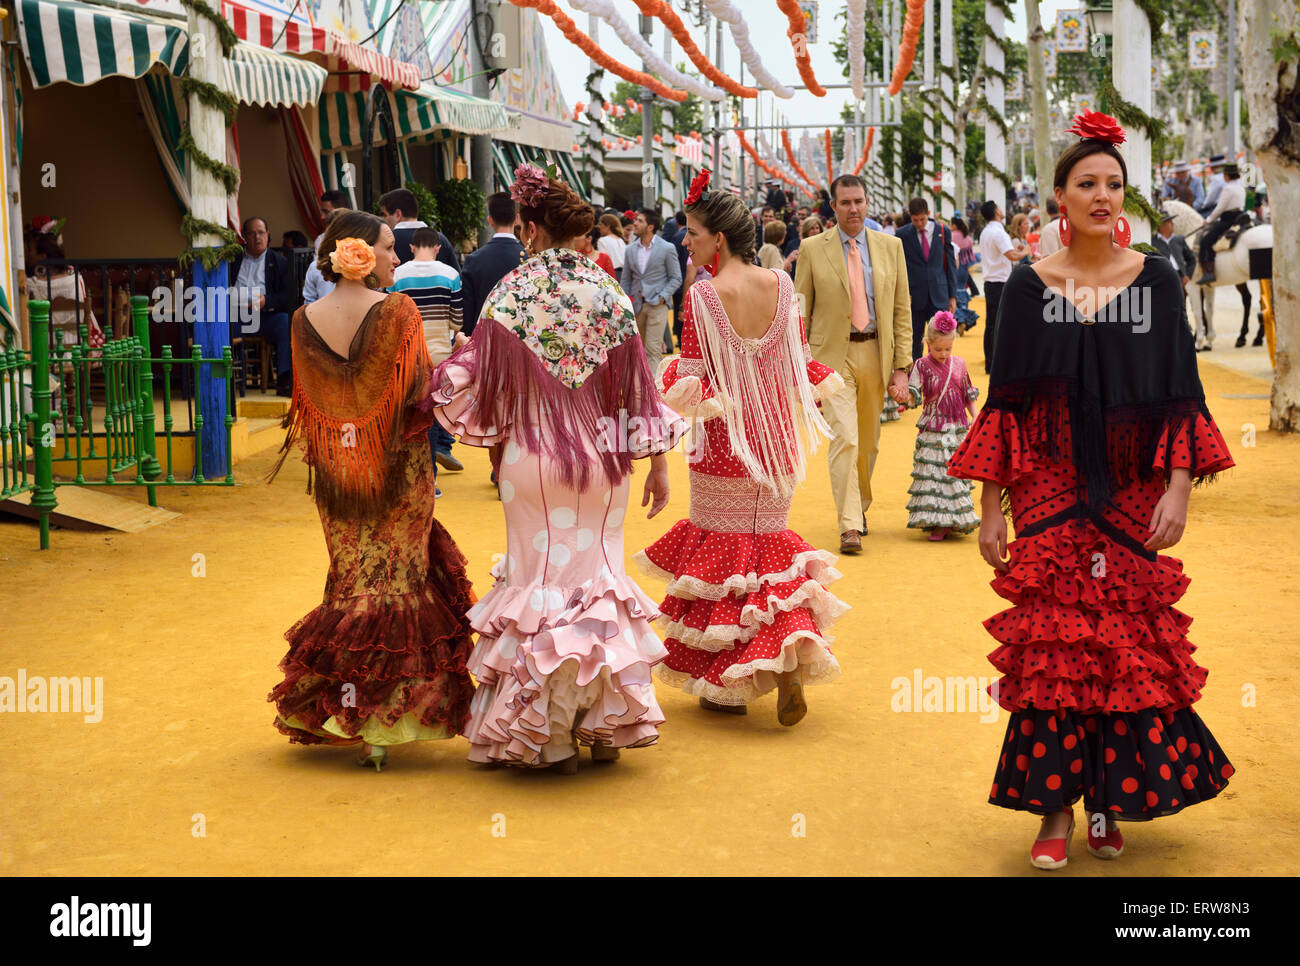 d5e6666d144 Women in flamenco dresses walking on ochre earth at the April Fair in Seville  Spain -